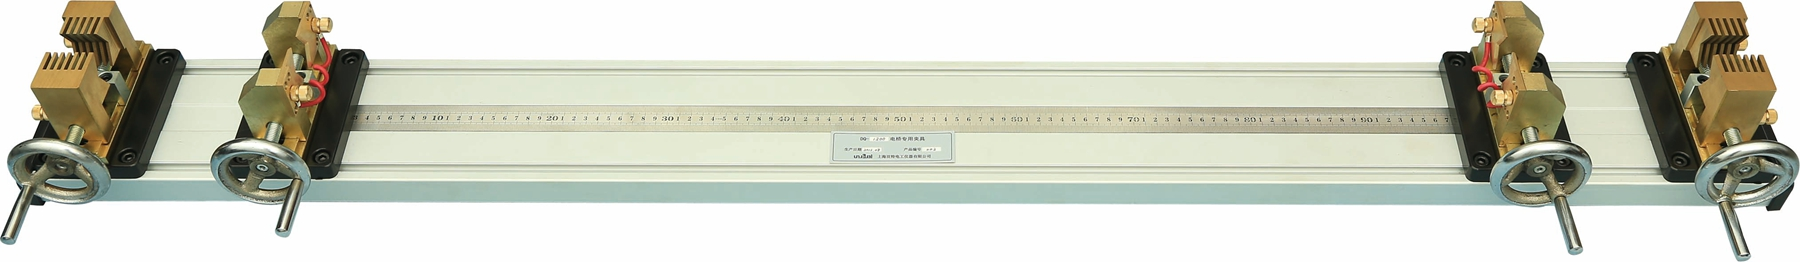 DQ-1200型电桥专用夹具